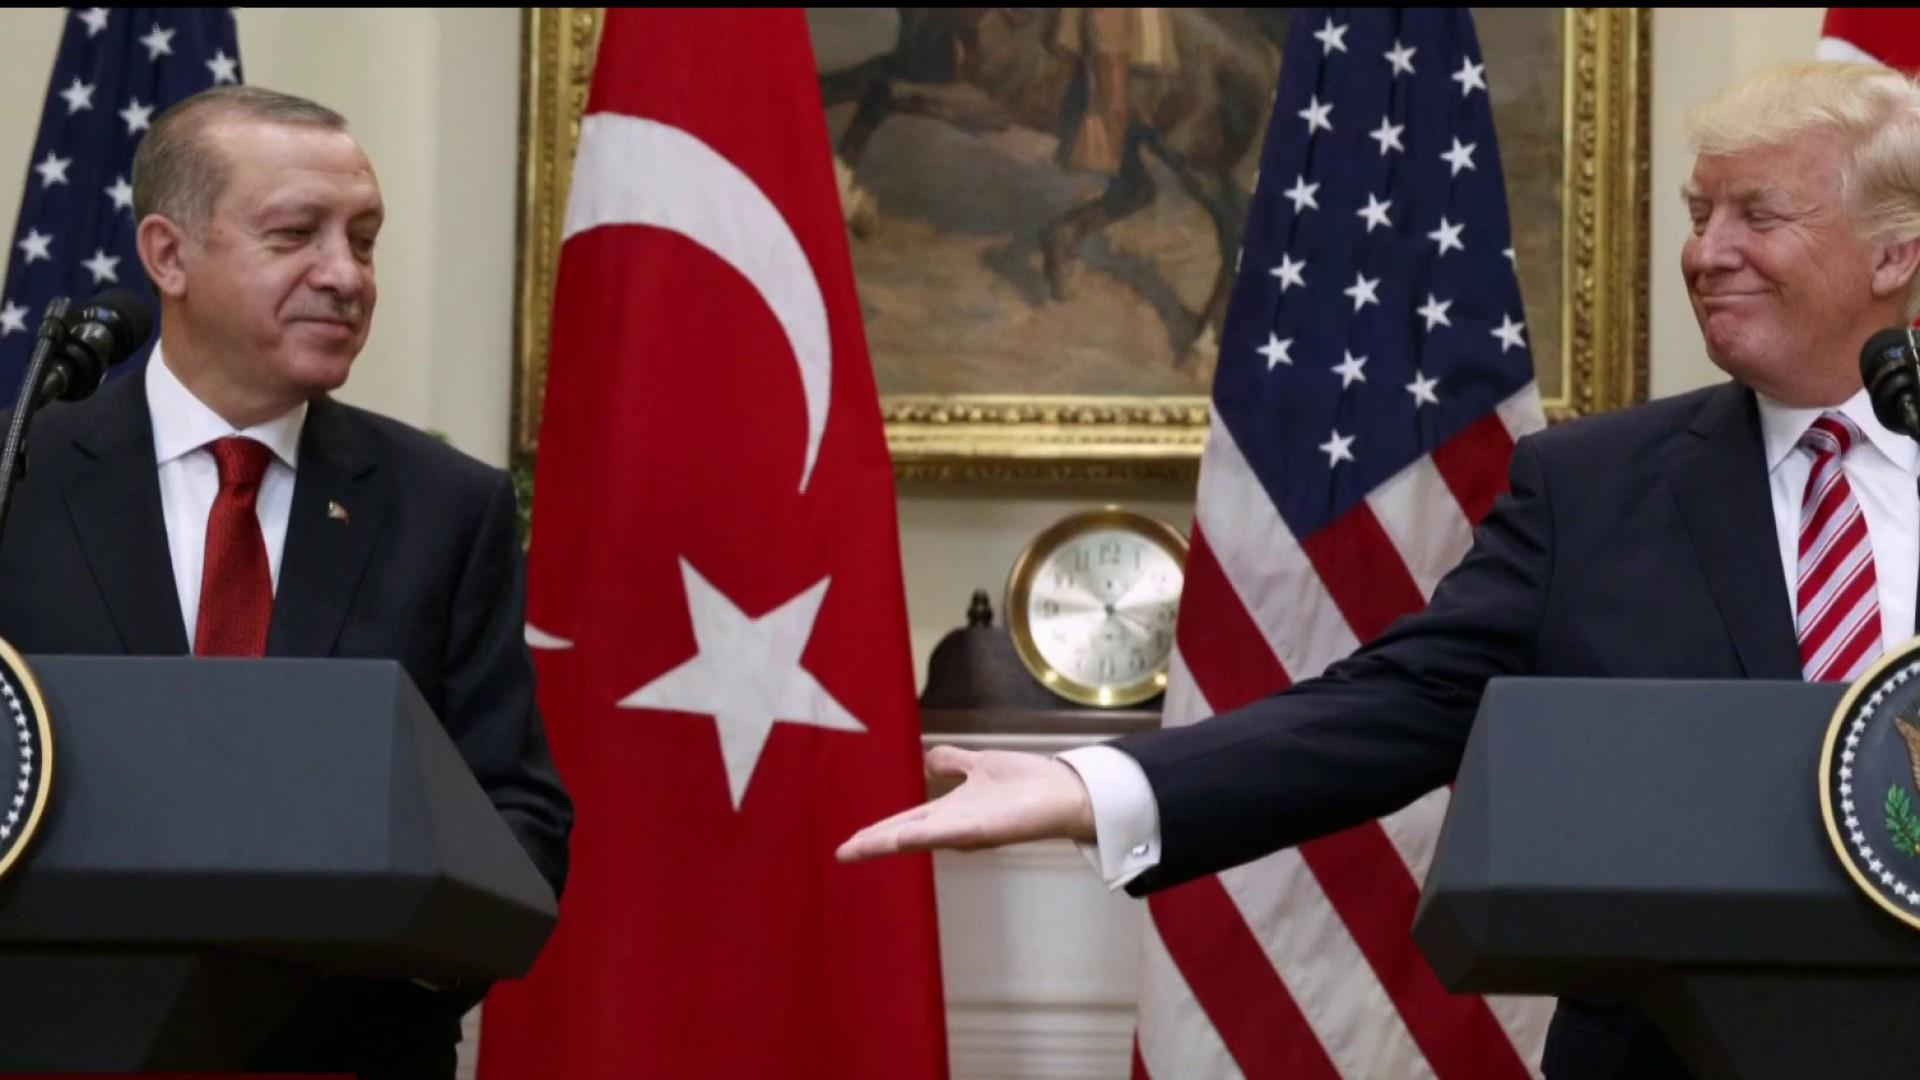 White House considers expelling Erdogan foe from US